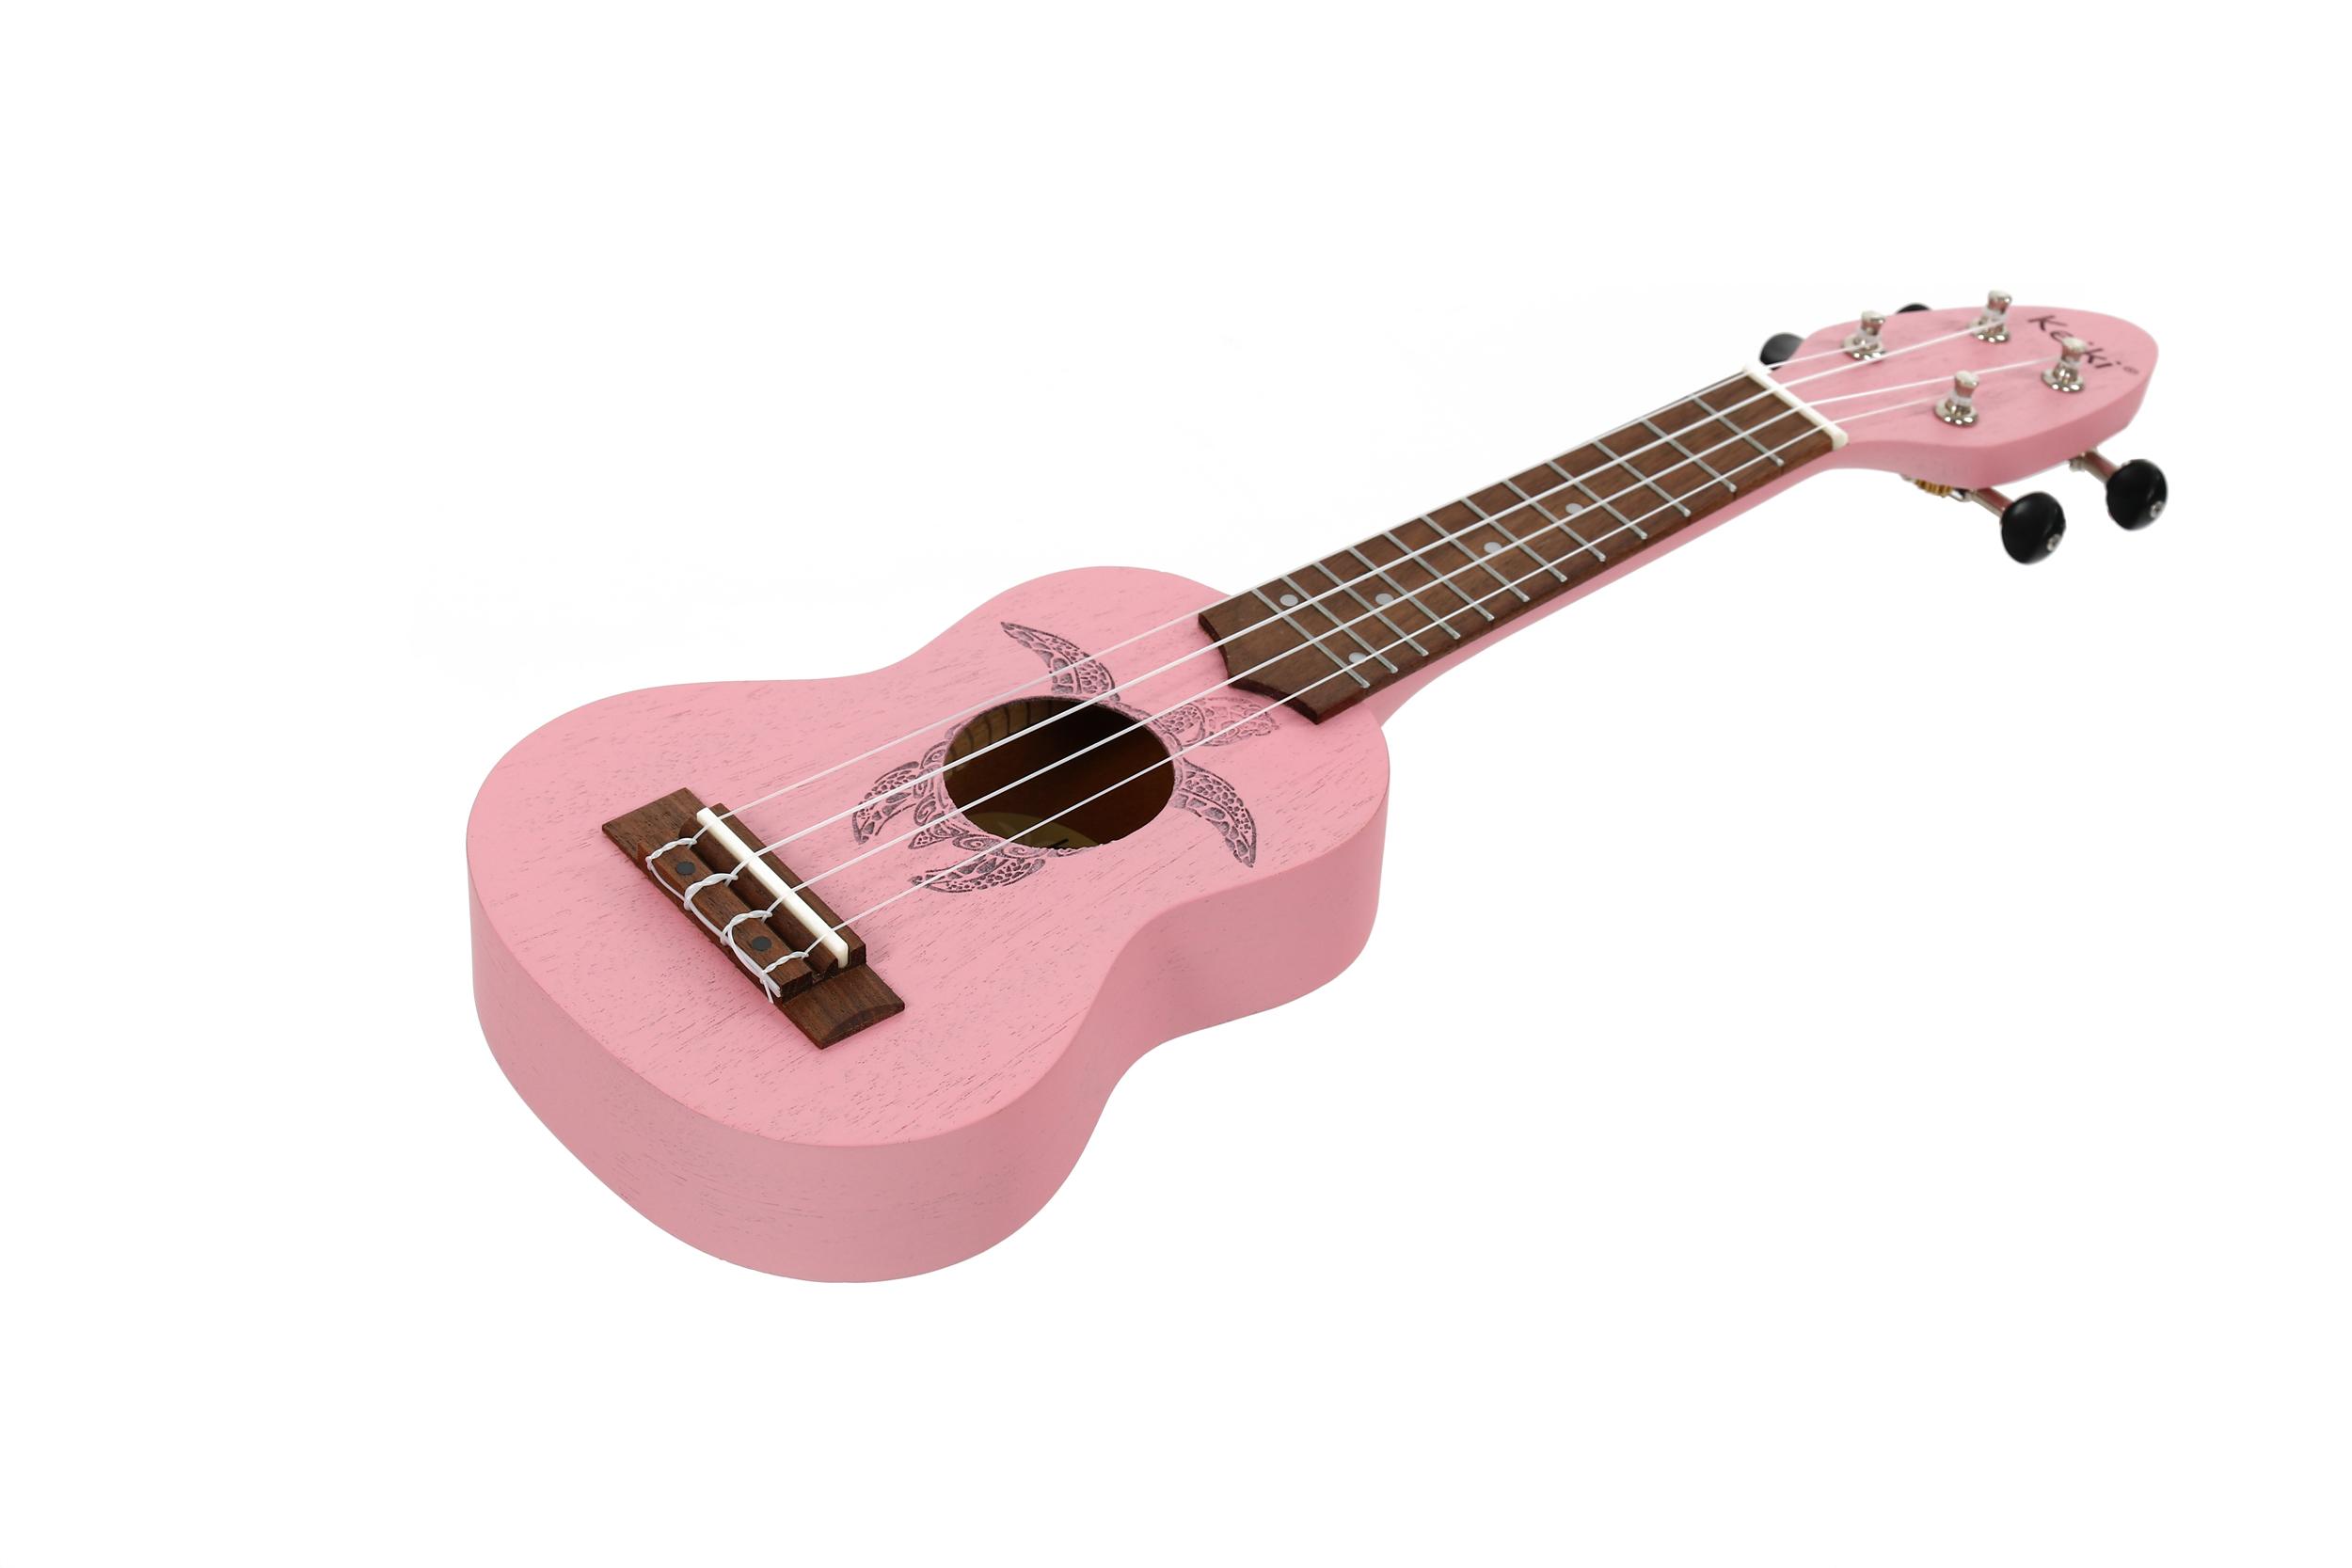 Ortega_Keiki K1-PNK_Ukulelen_8_Guitar Shop Corda